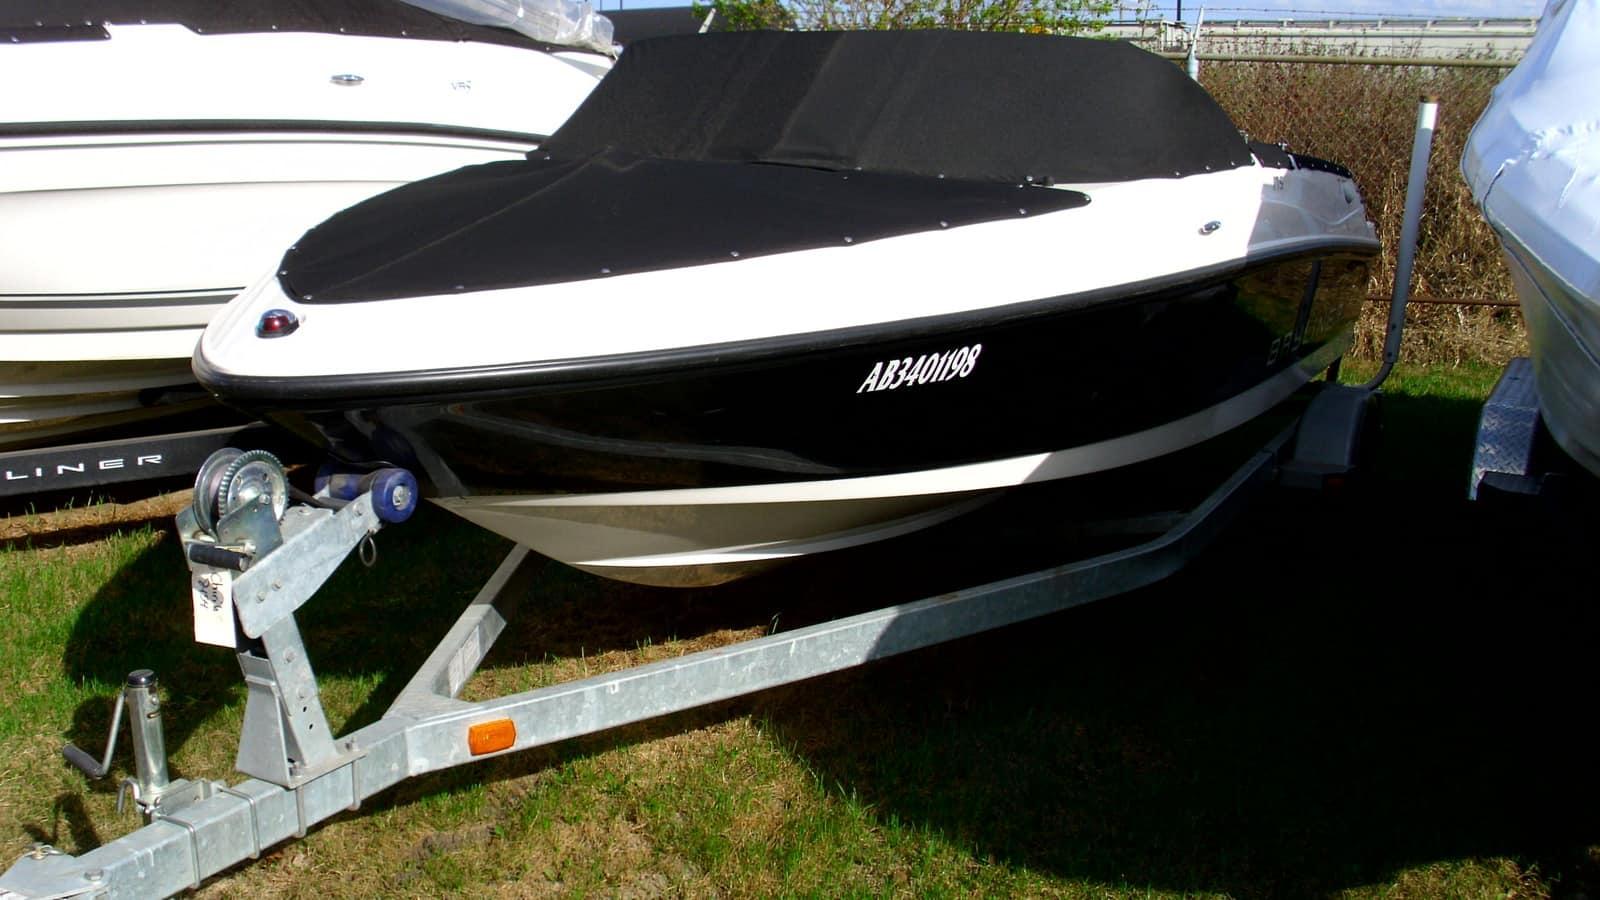 USED 2012 Bayliner 175 BR Fish and Ski - Shipwreck Marine